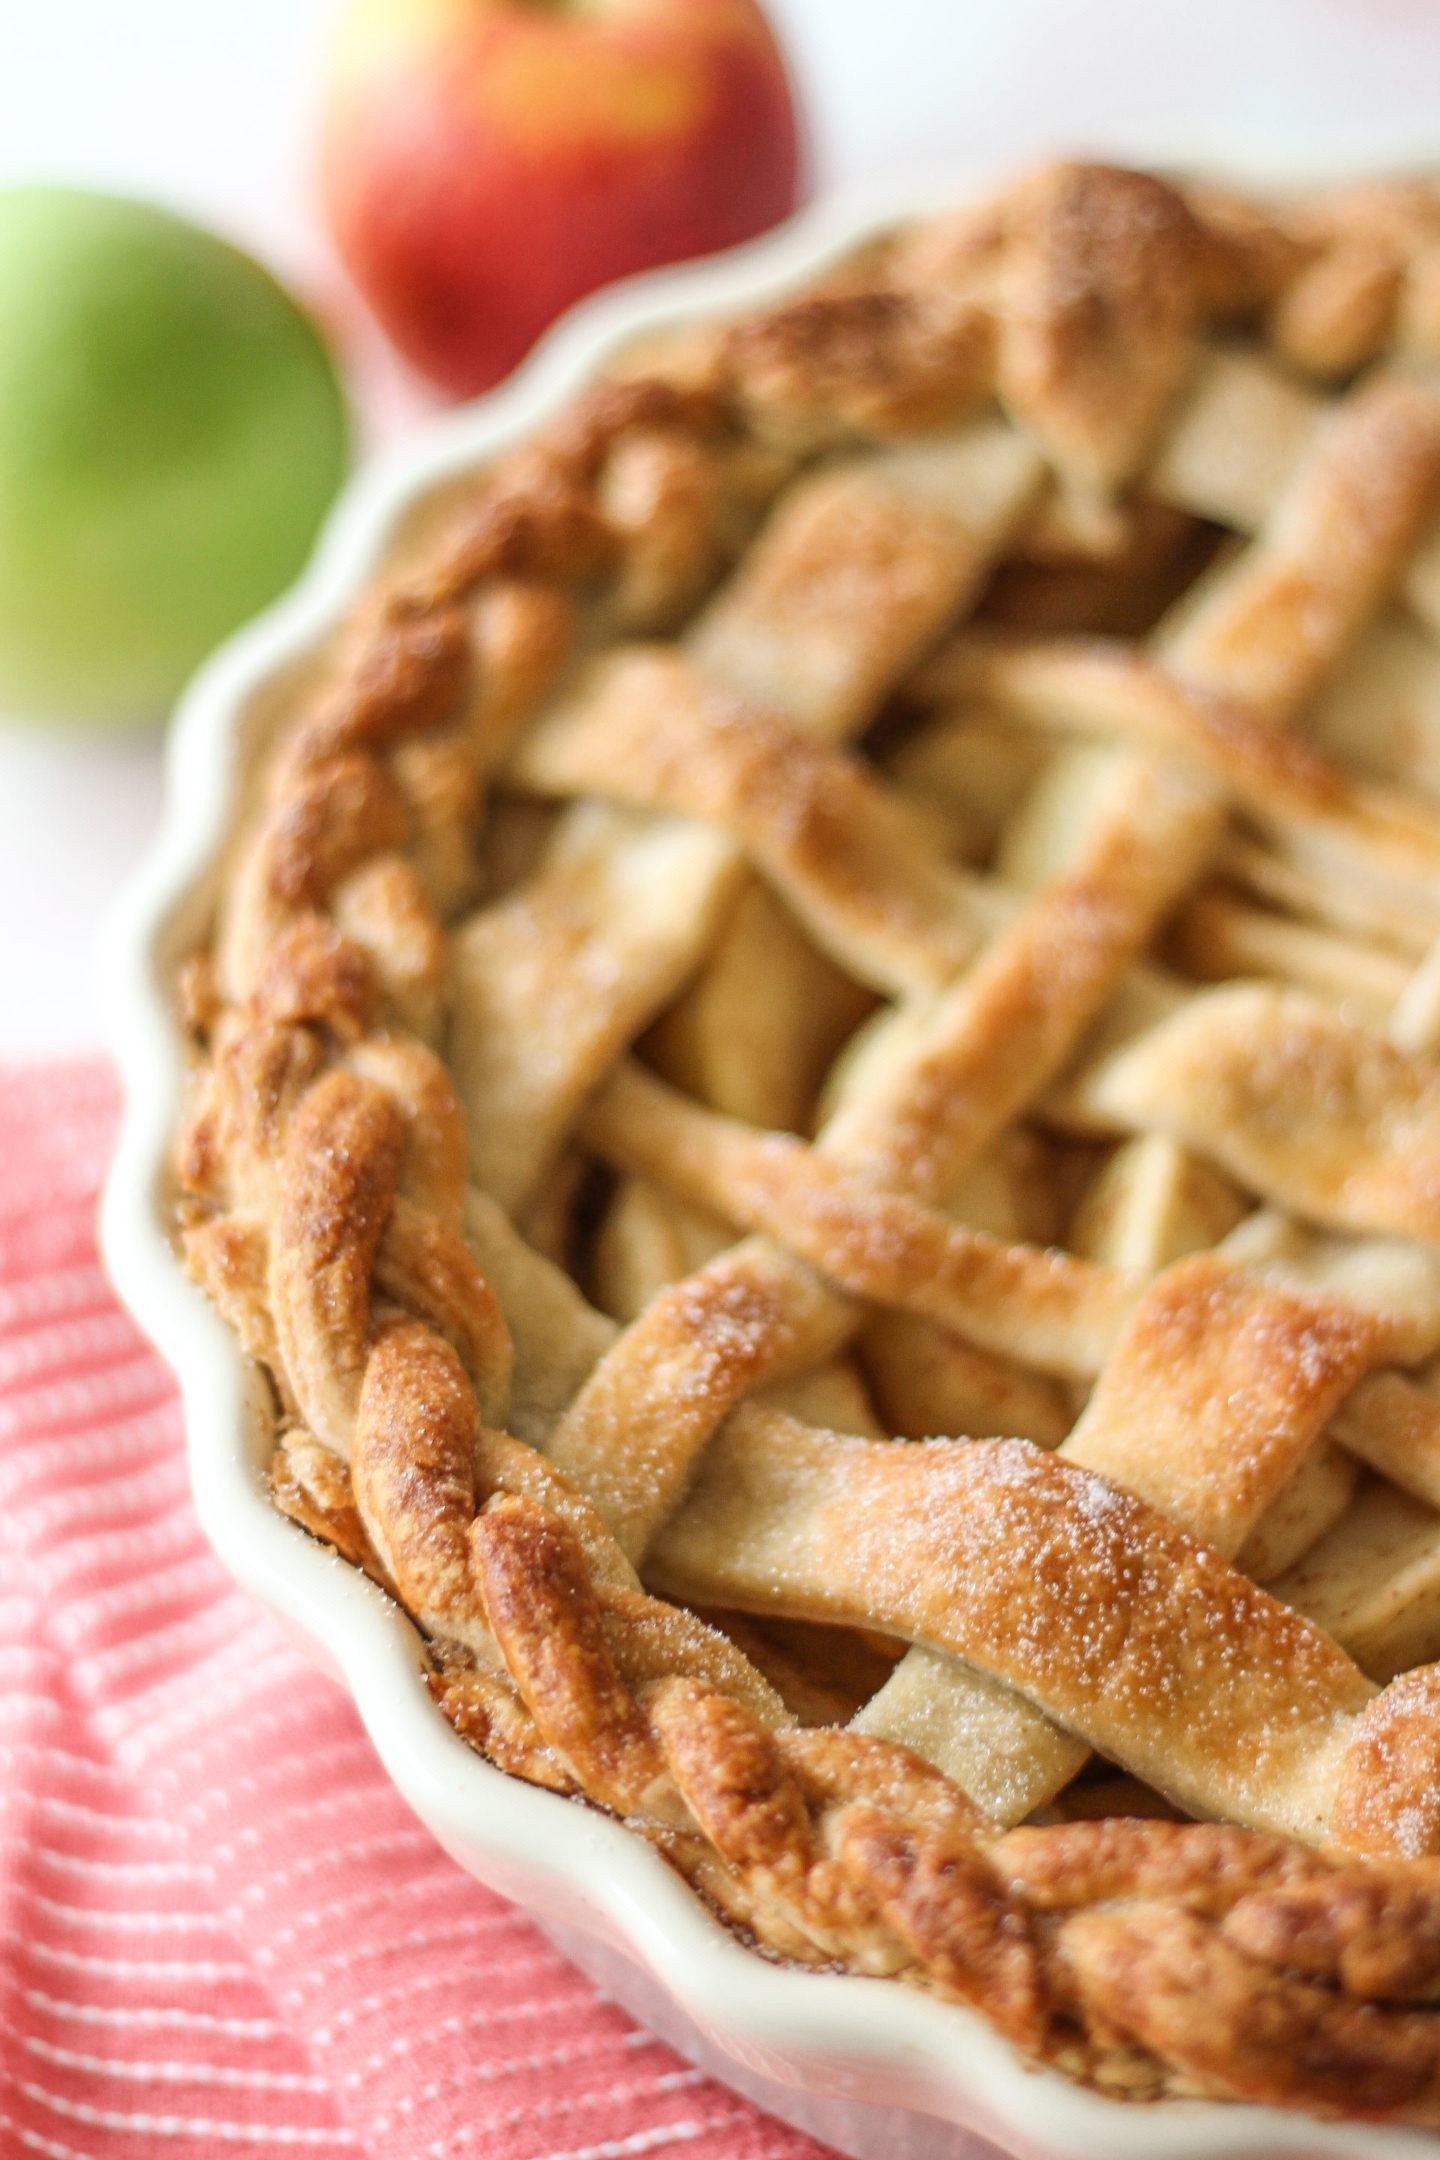 close up of lattice apple pie in pie dish, focussed on outer plaited crust